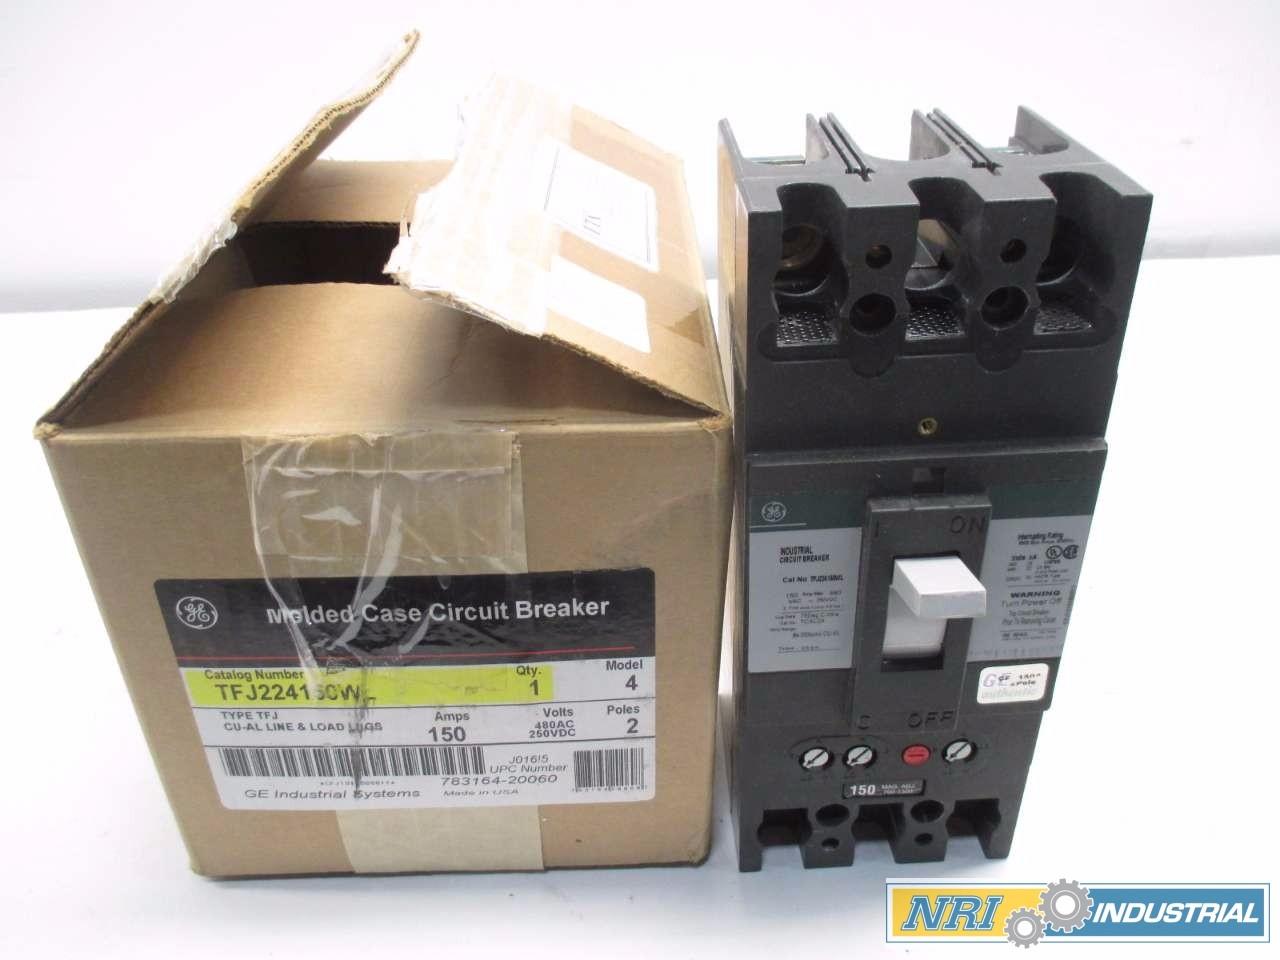 NEW GENERAL ELECTRIC 150 A CIRCUIT BREAKER